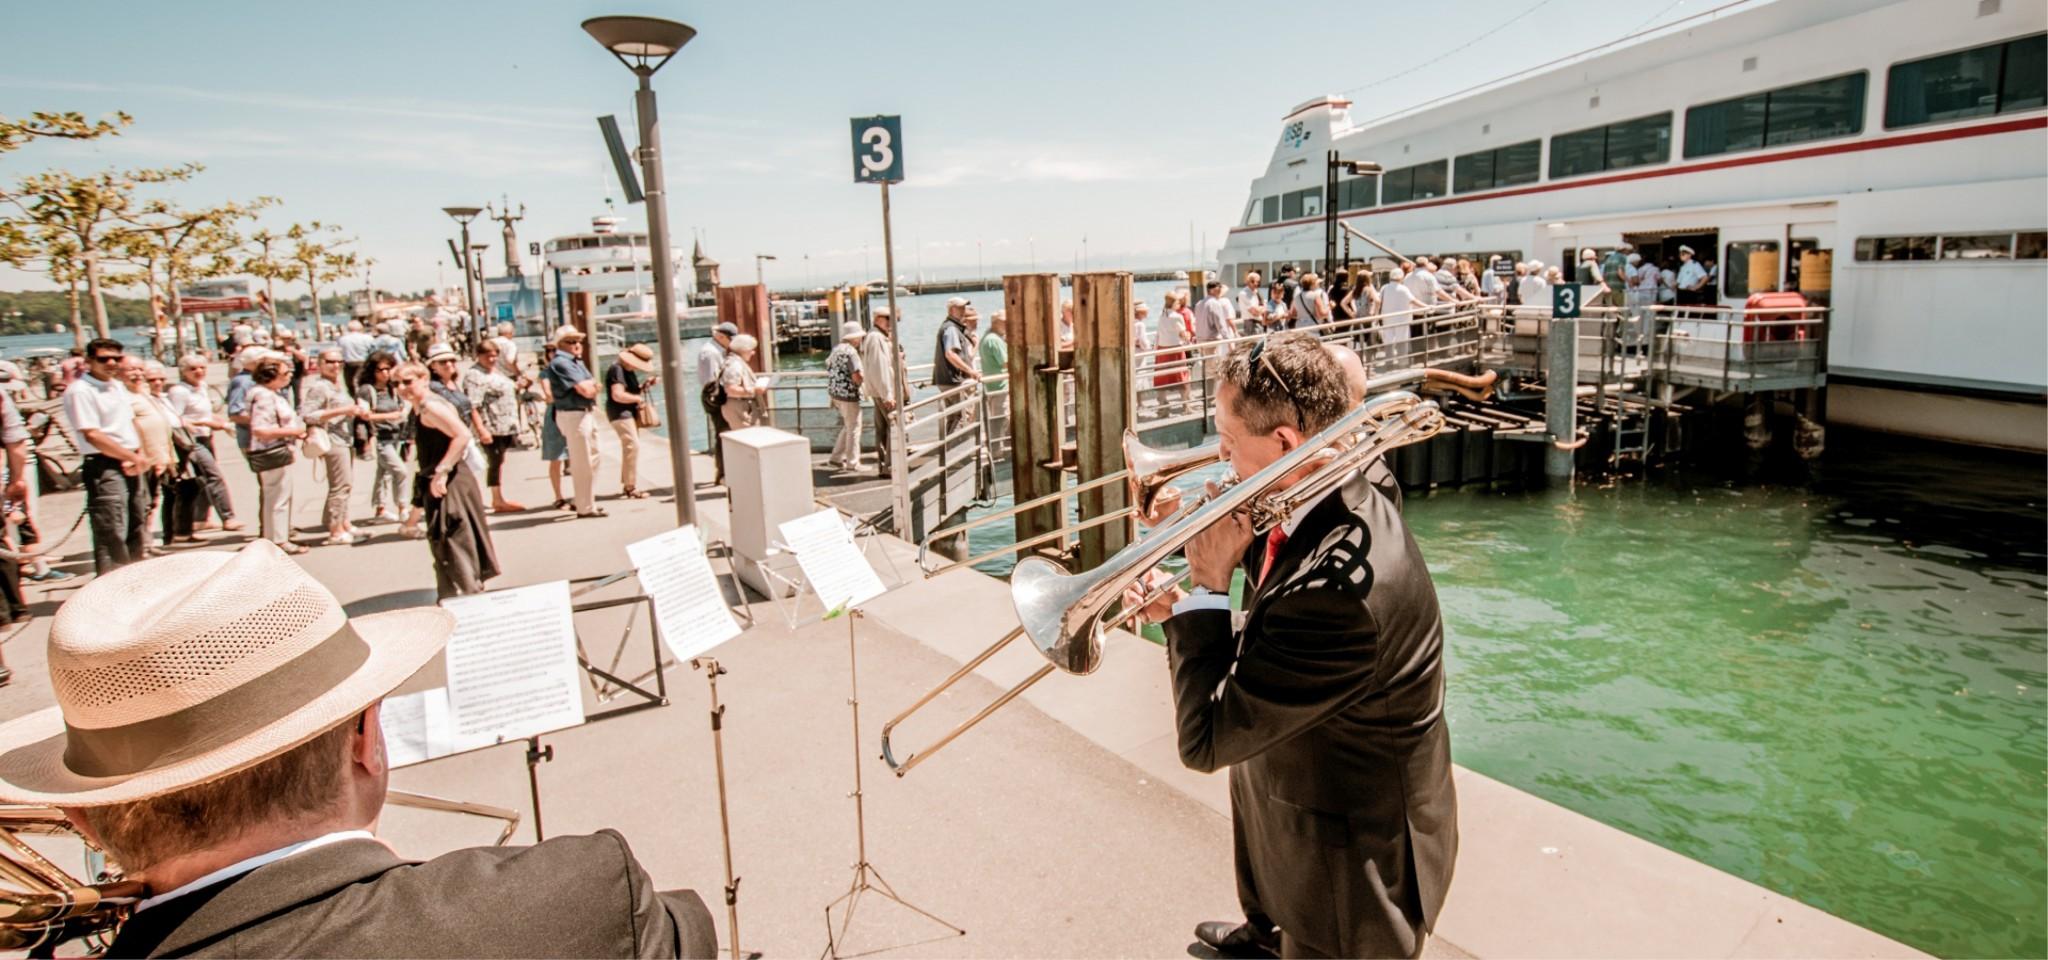 19-06-02 KN_Musik an Bord_c_Victor Marin Roman